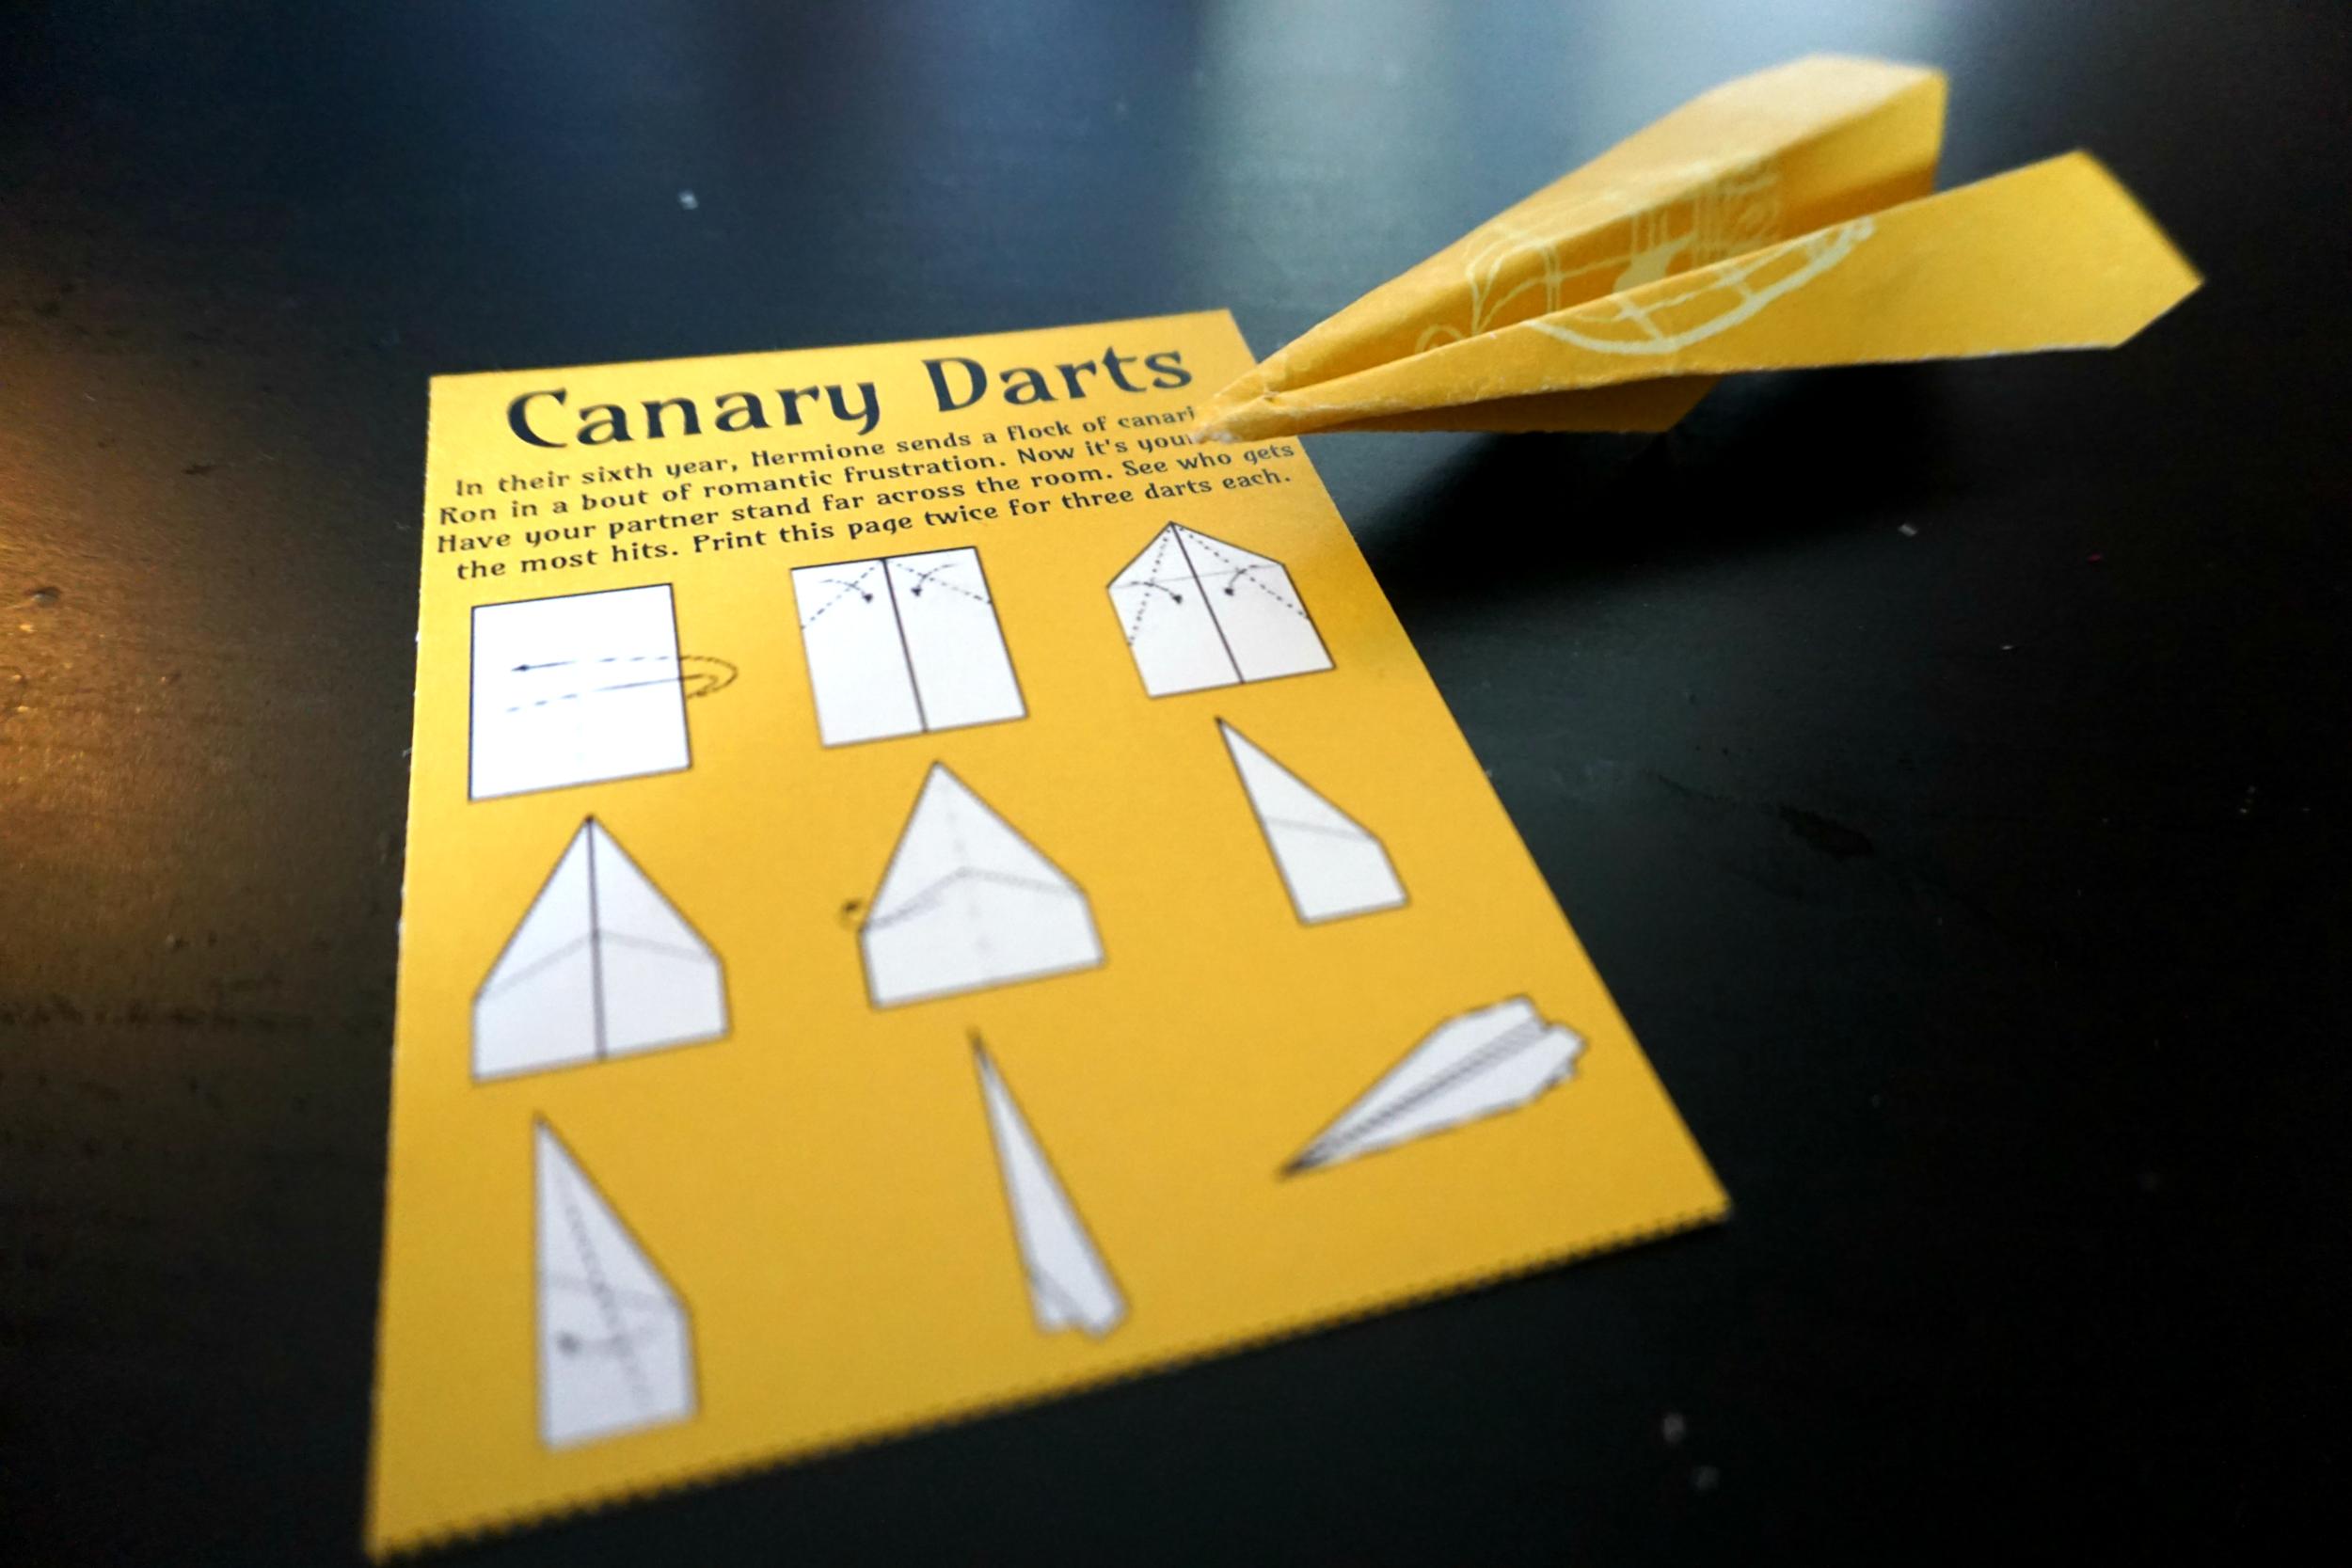 Canary Darts 1 Edit.png